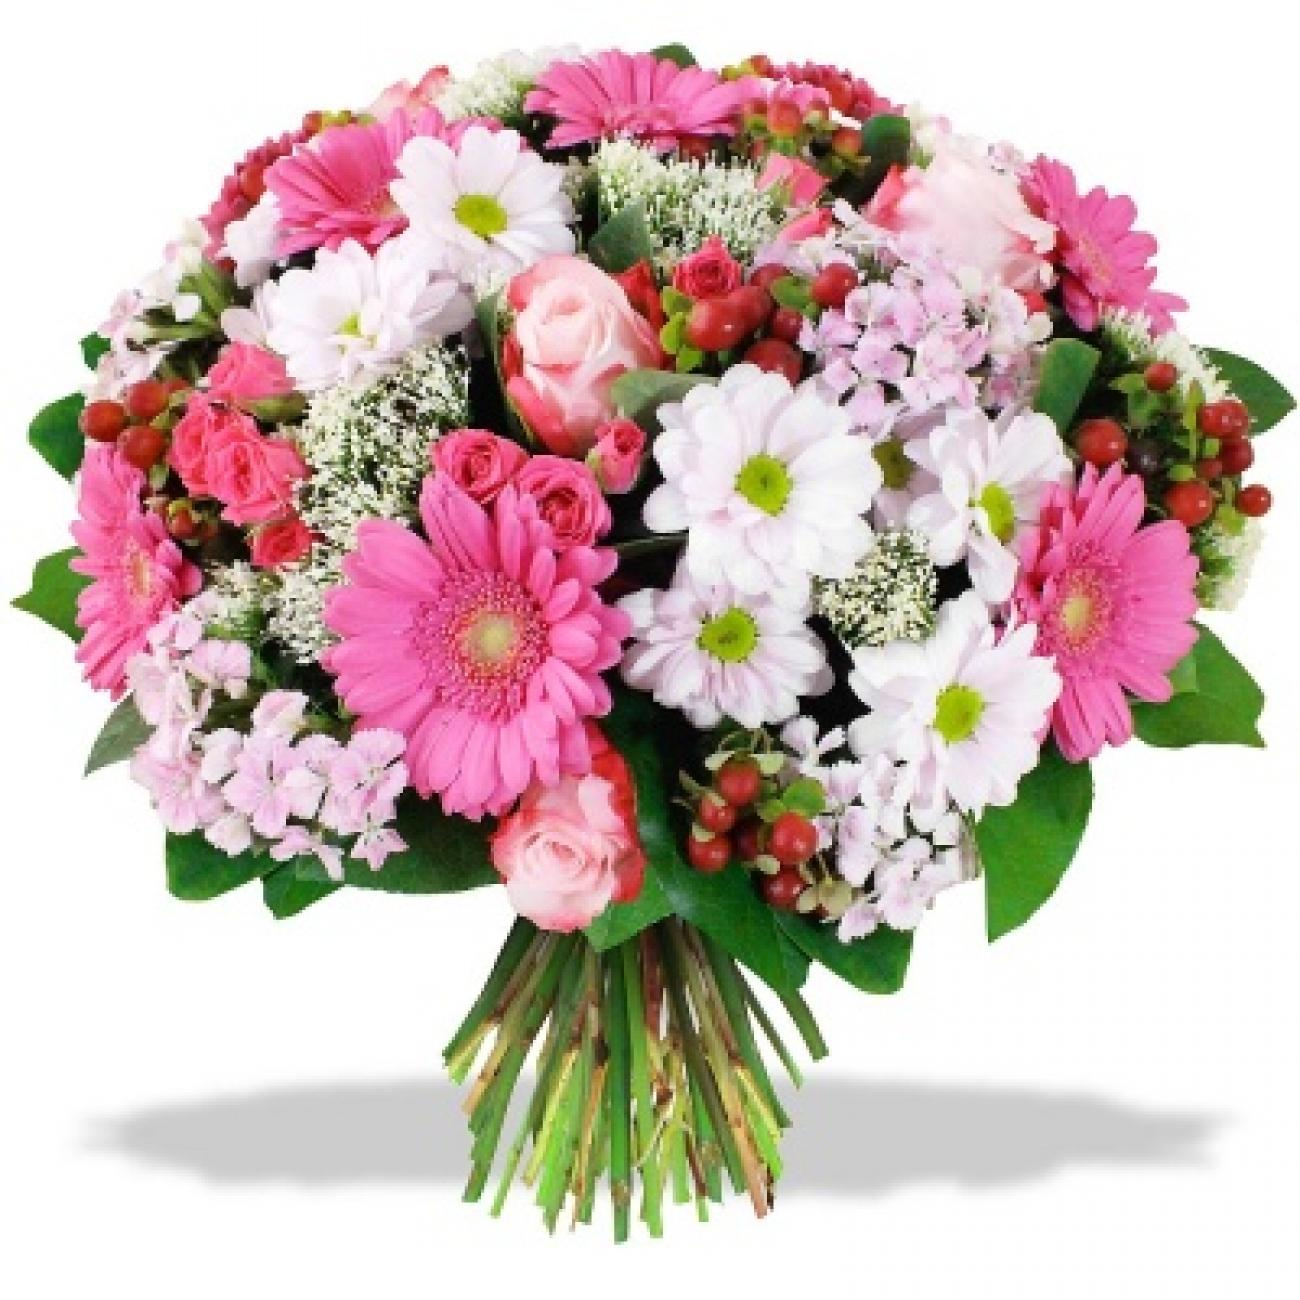 bouquet-rond-gerbera-hypericum-millepertuis-oeillet-rose-rose-blanc-rouge_17798.jpg